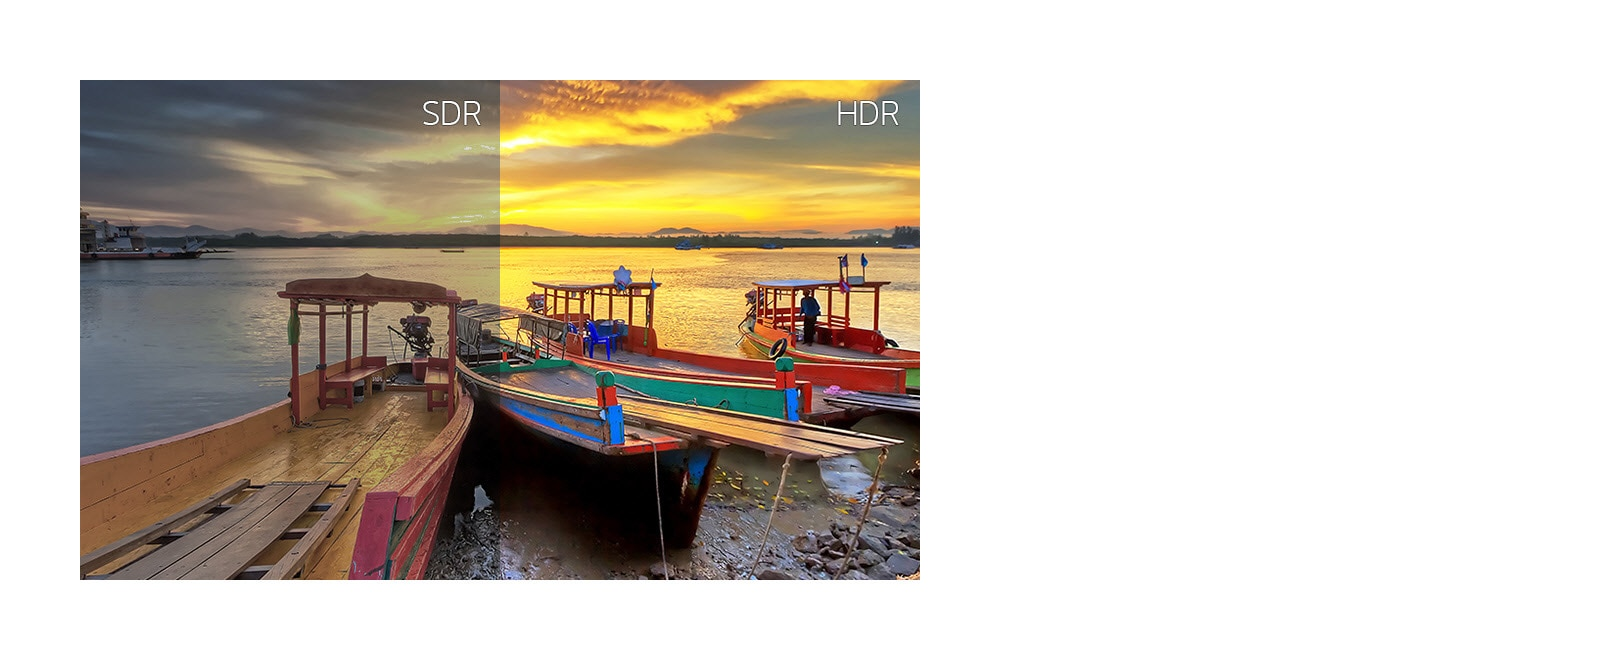 MNT-34WL500-Feature-02-HDR10-Desktop